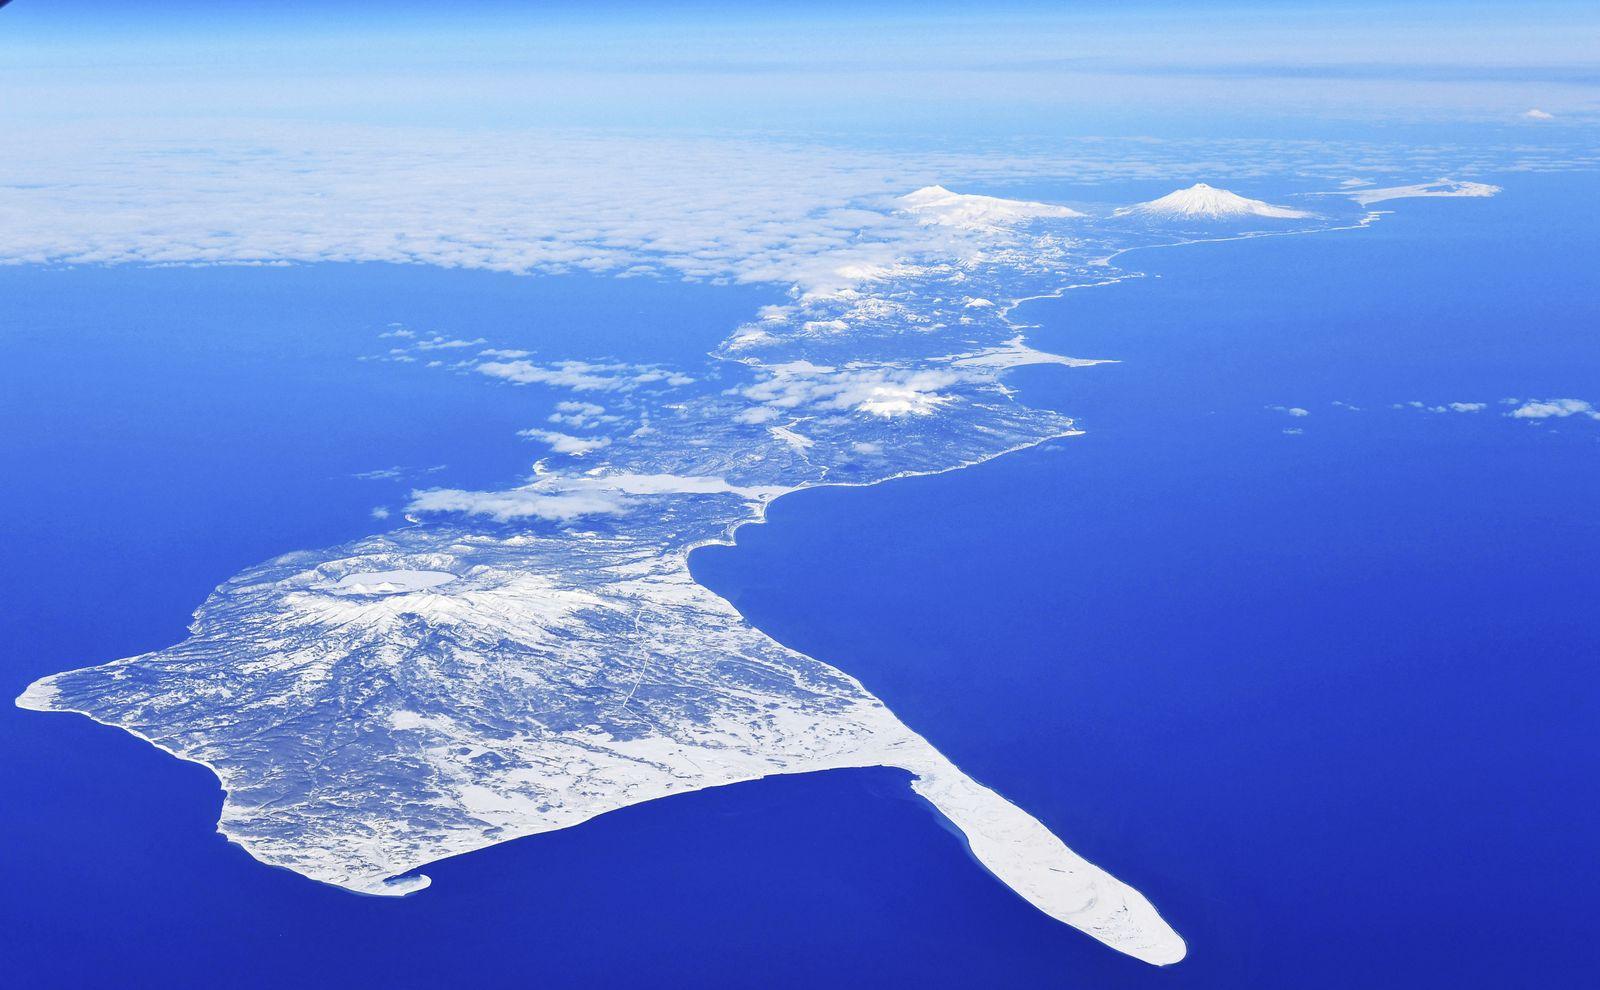 Inseln/ Inselgruppe/ Russland/ Japan/ Northern Territories